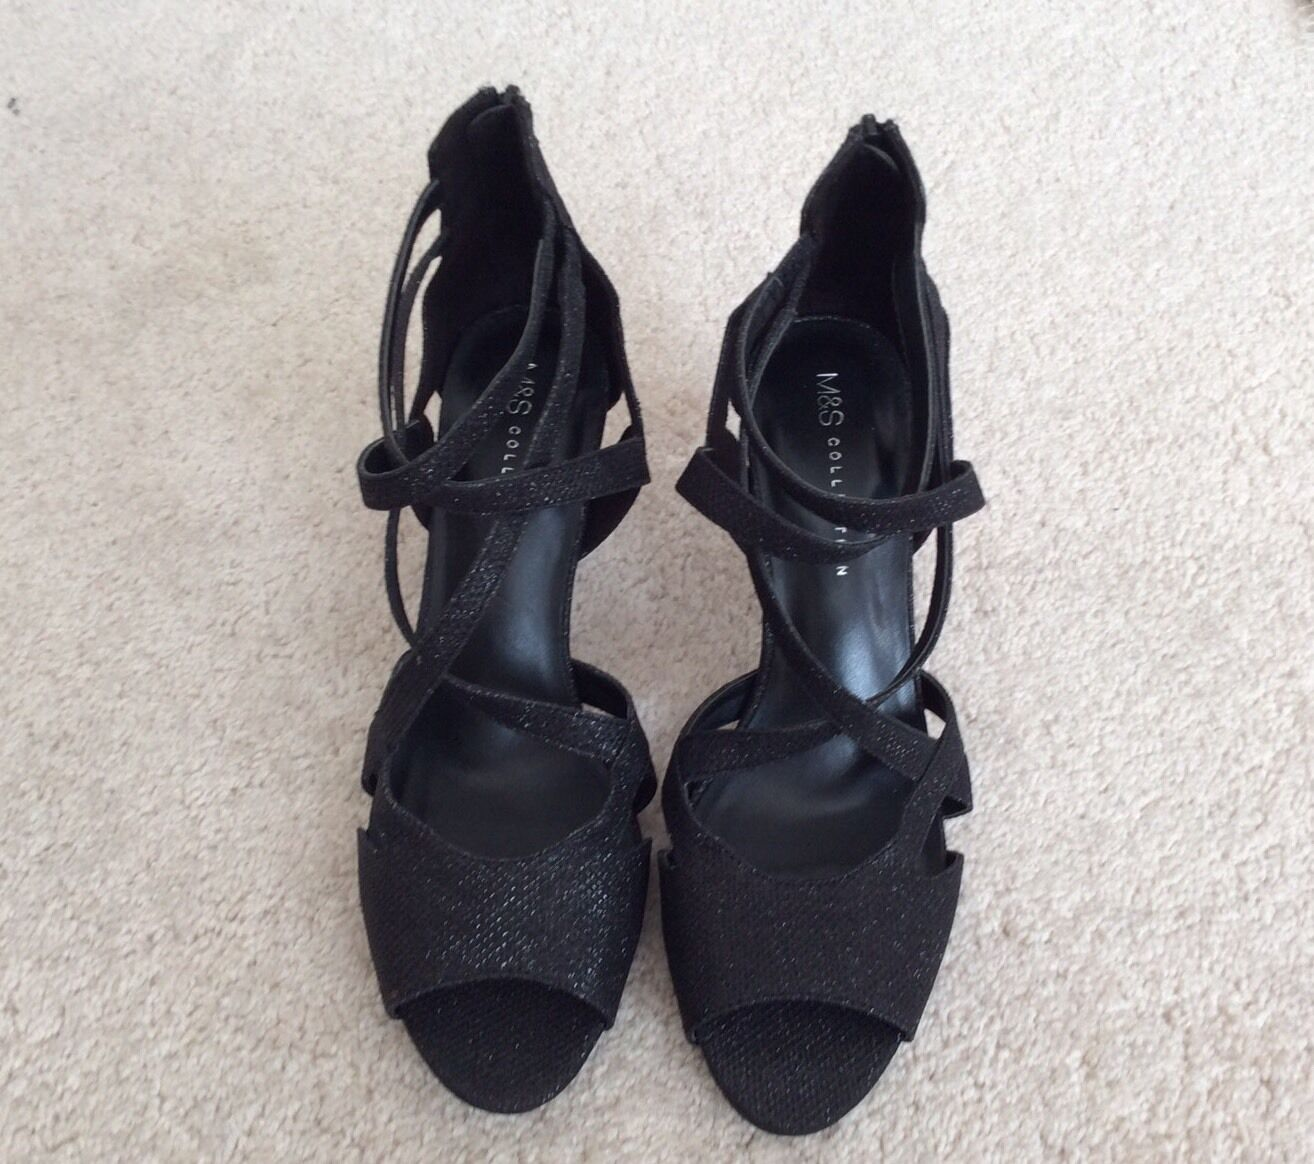 M&S Collection with Insolia Black Sparkle Stiletto New Open Toe Shoes - New Stiletto bf3df6